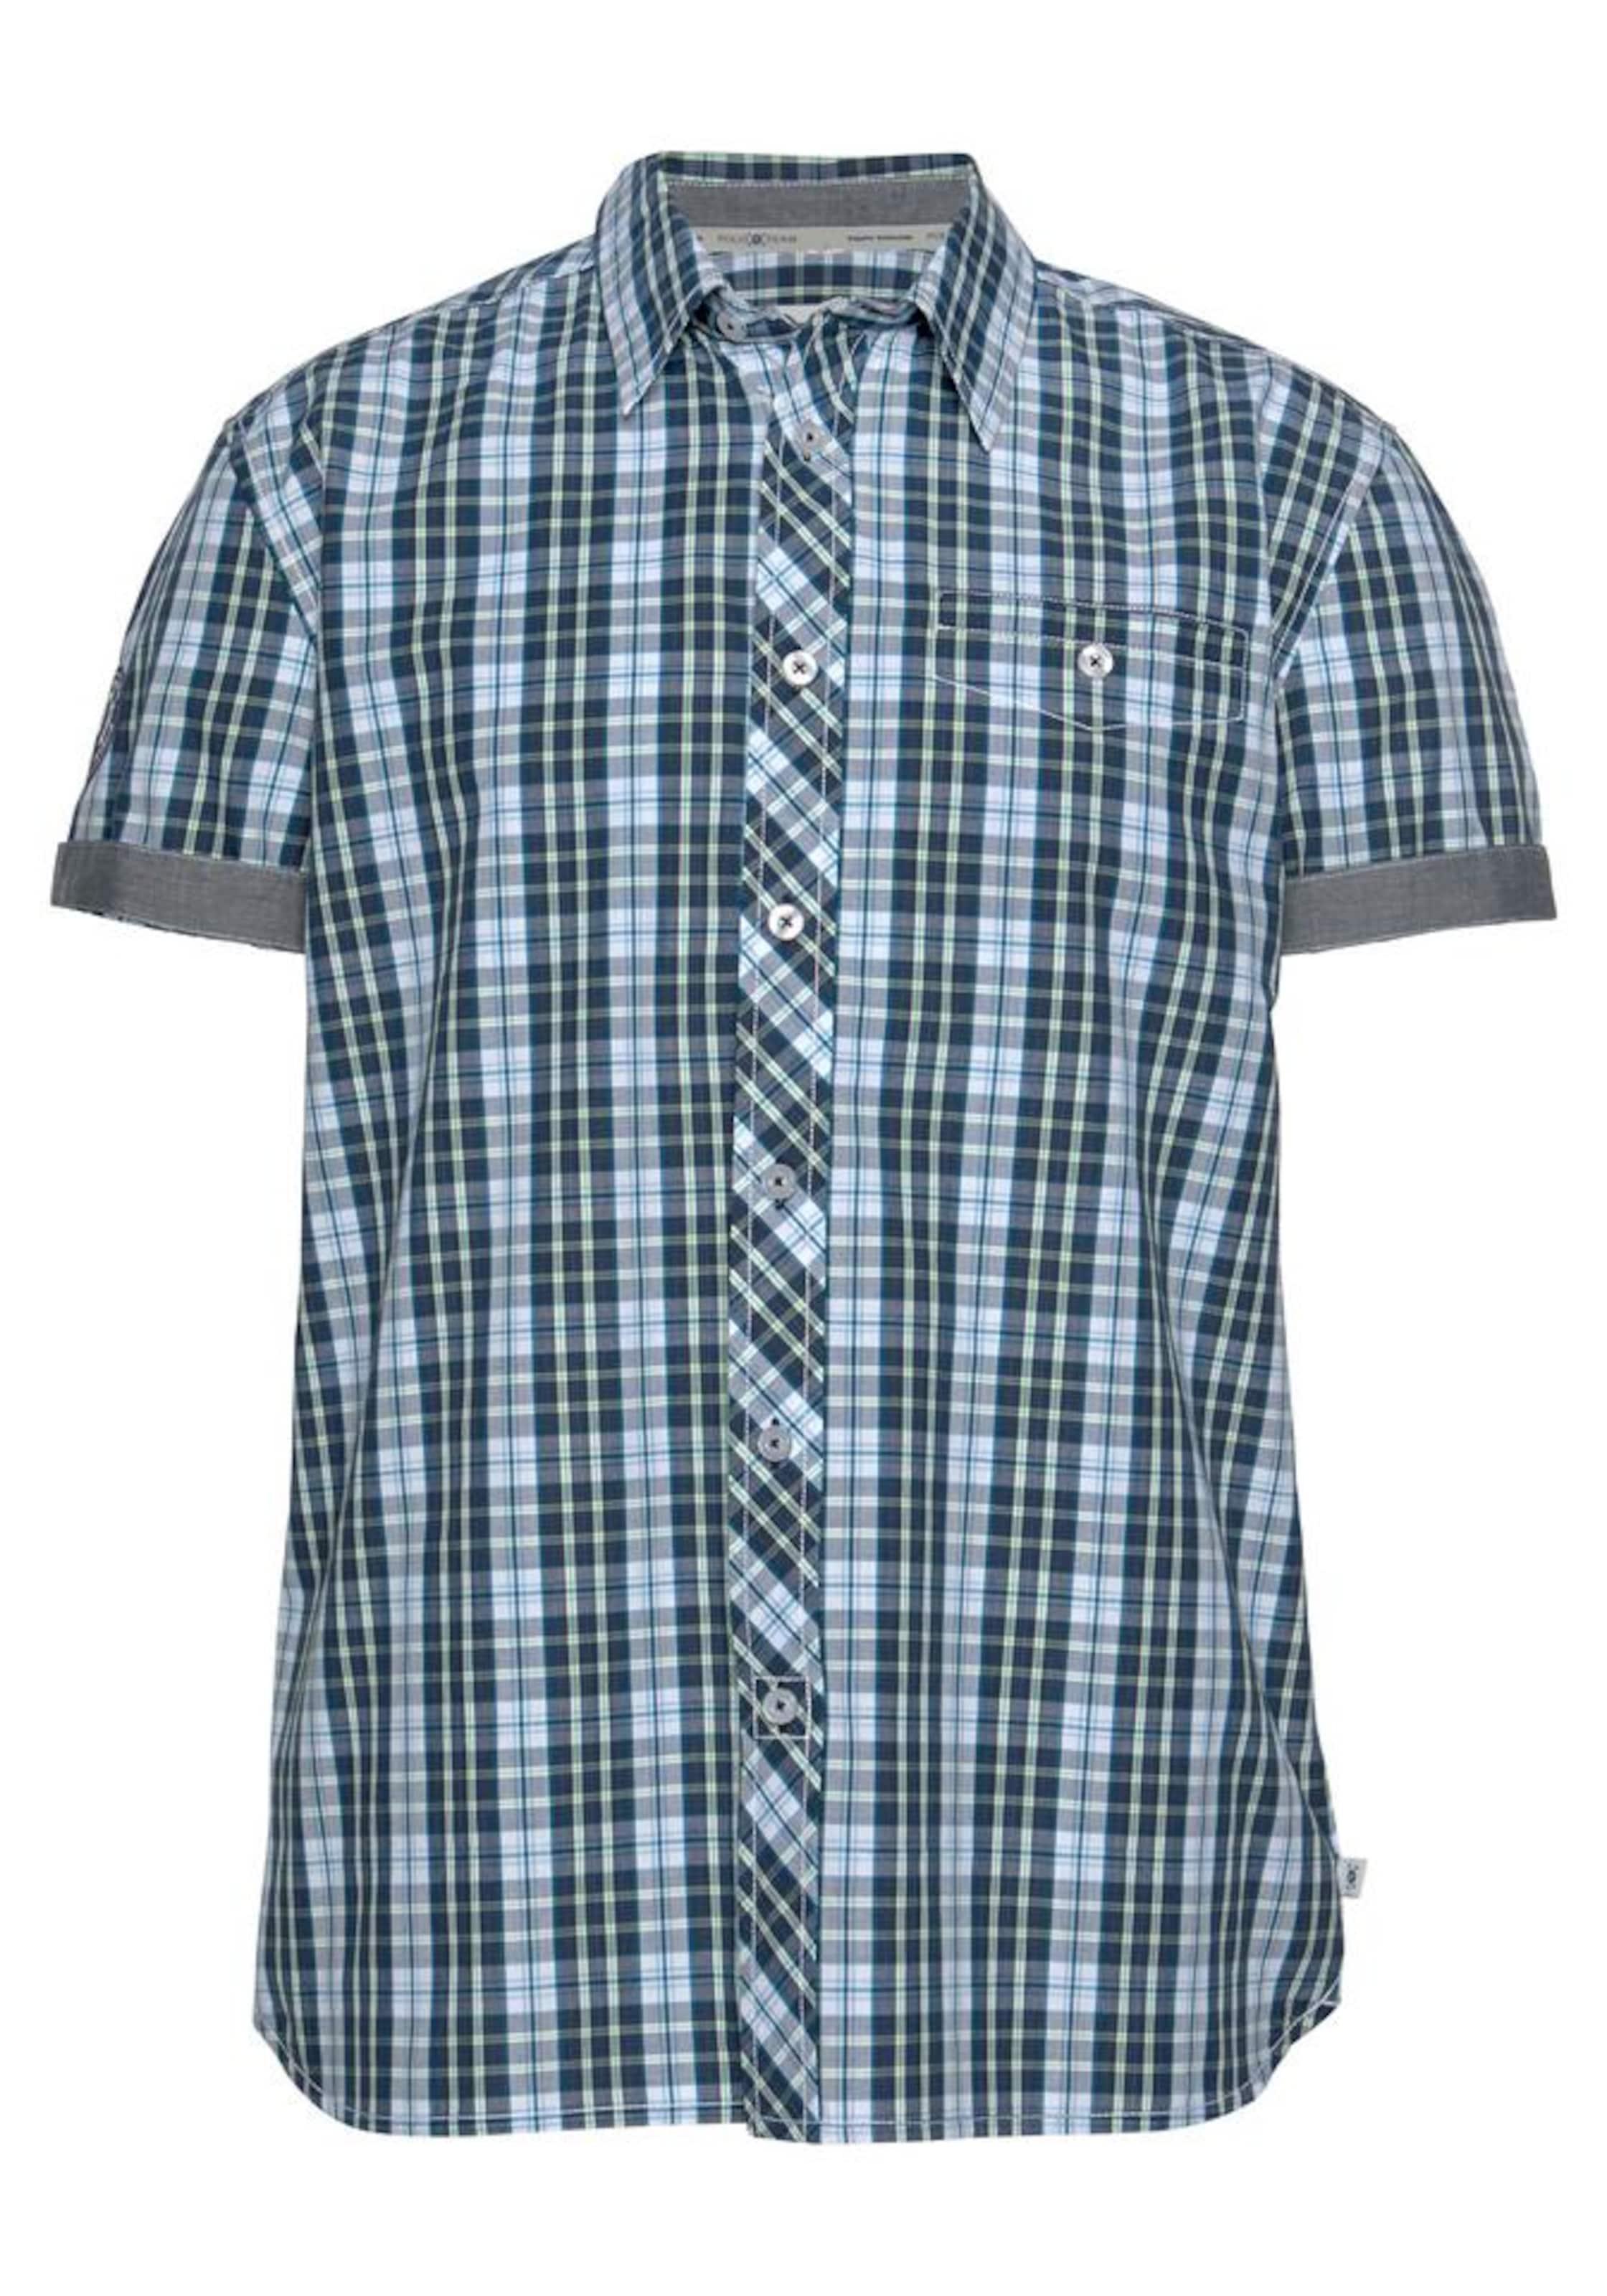 BlauGrün Weiß In Tom Tailor Team Polo Kurzarmhemd UzVqSMp